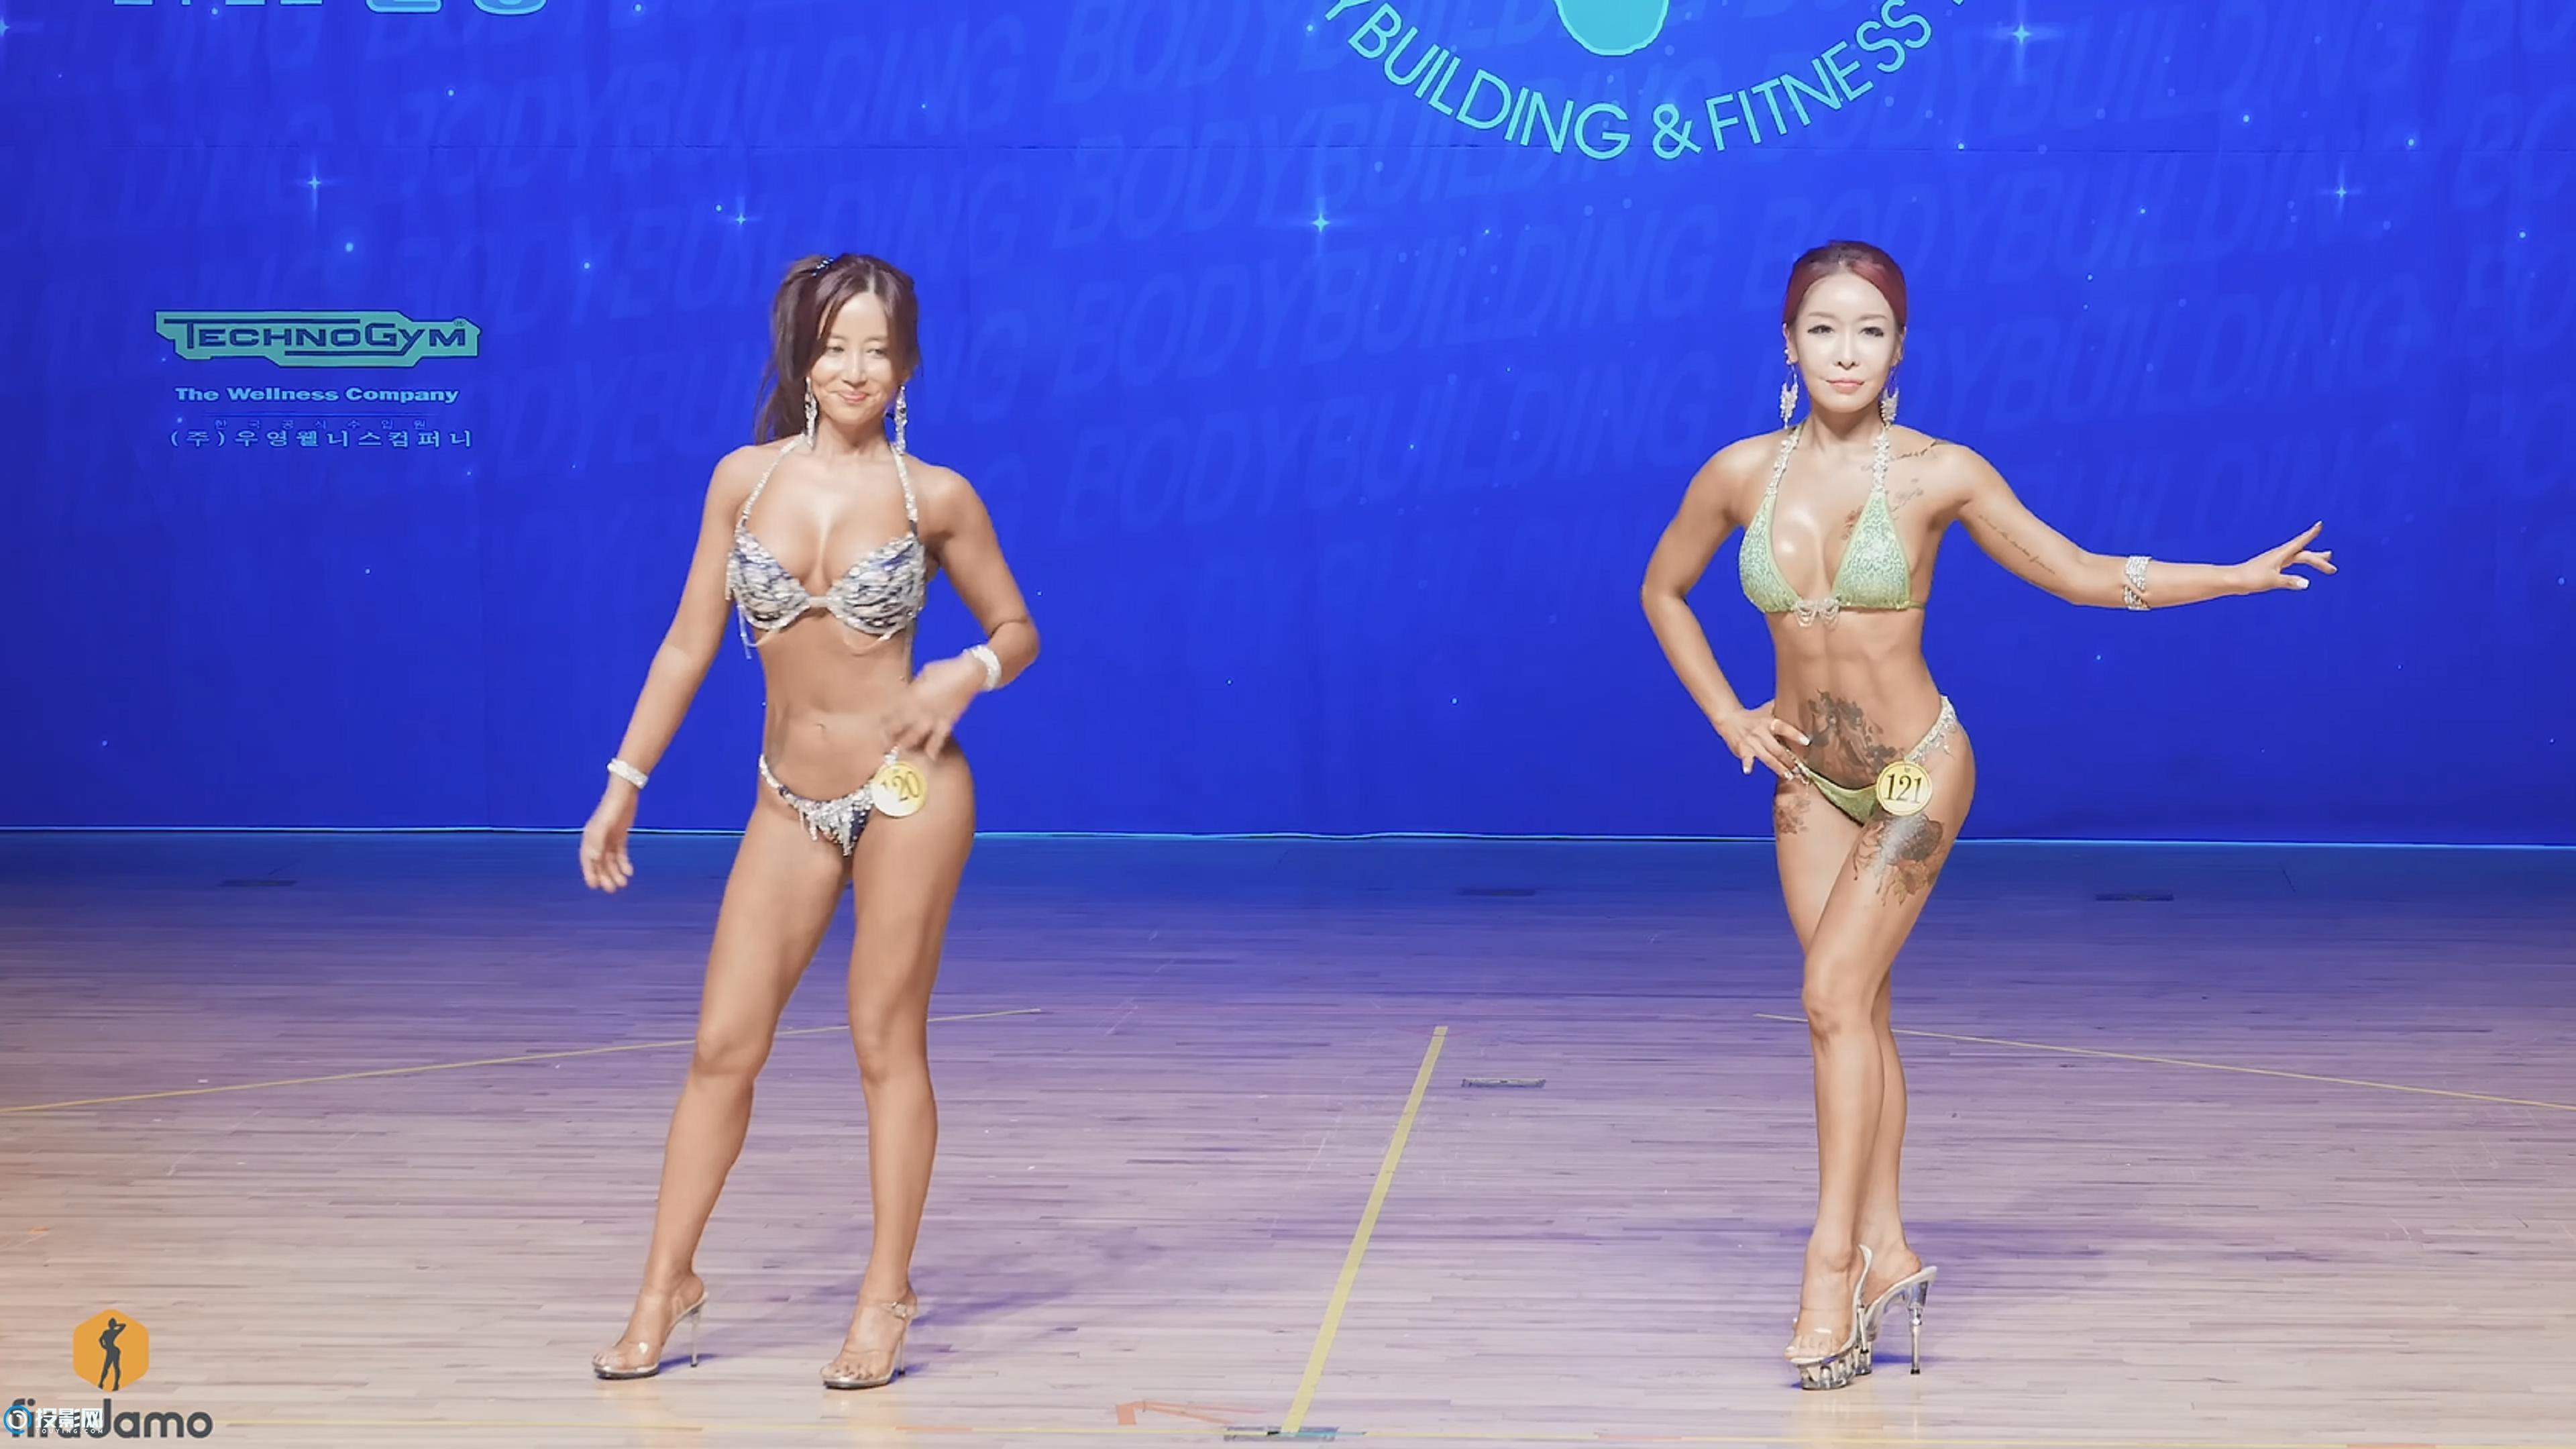 4K超清片-韩国比基尼健美比赛现场实拍13 [2160P/MP4/215MB]